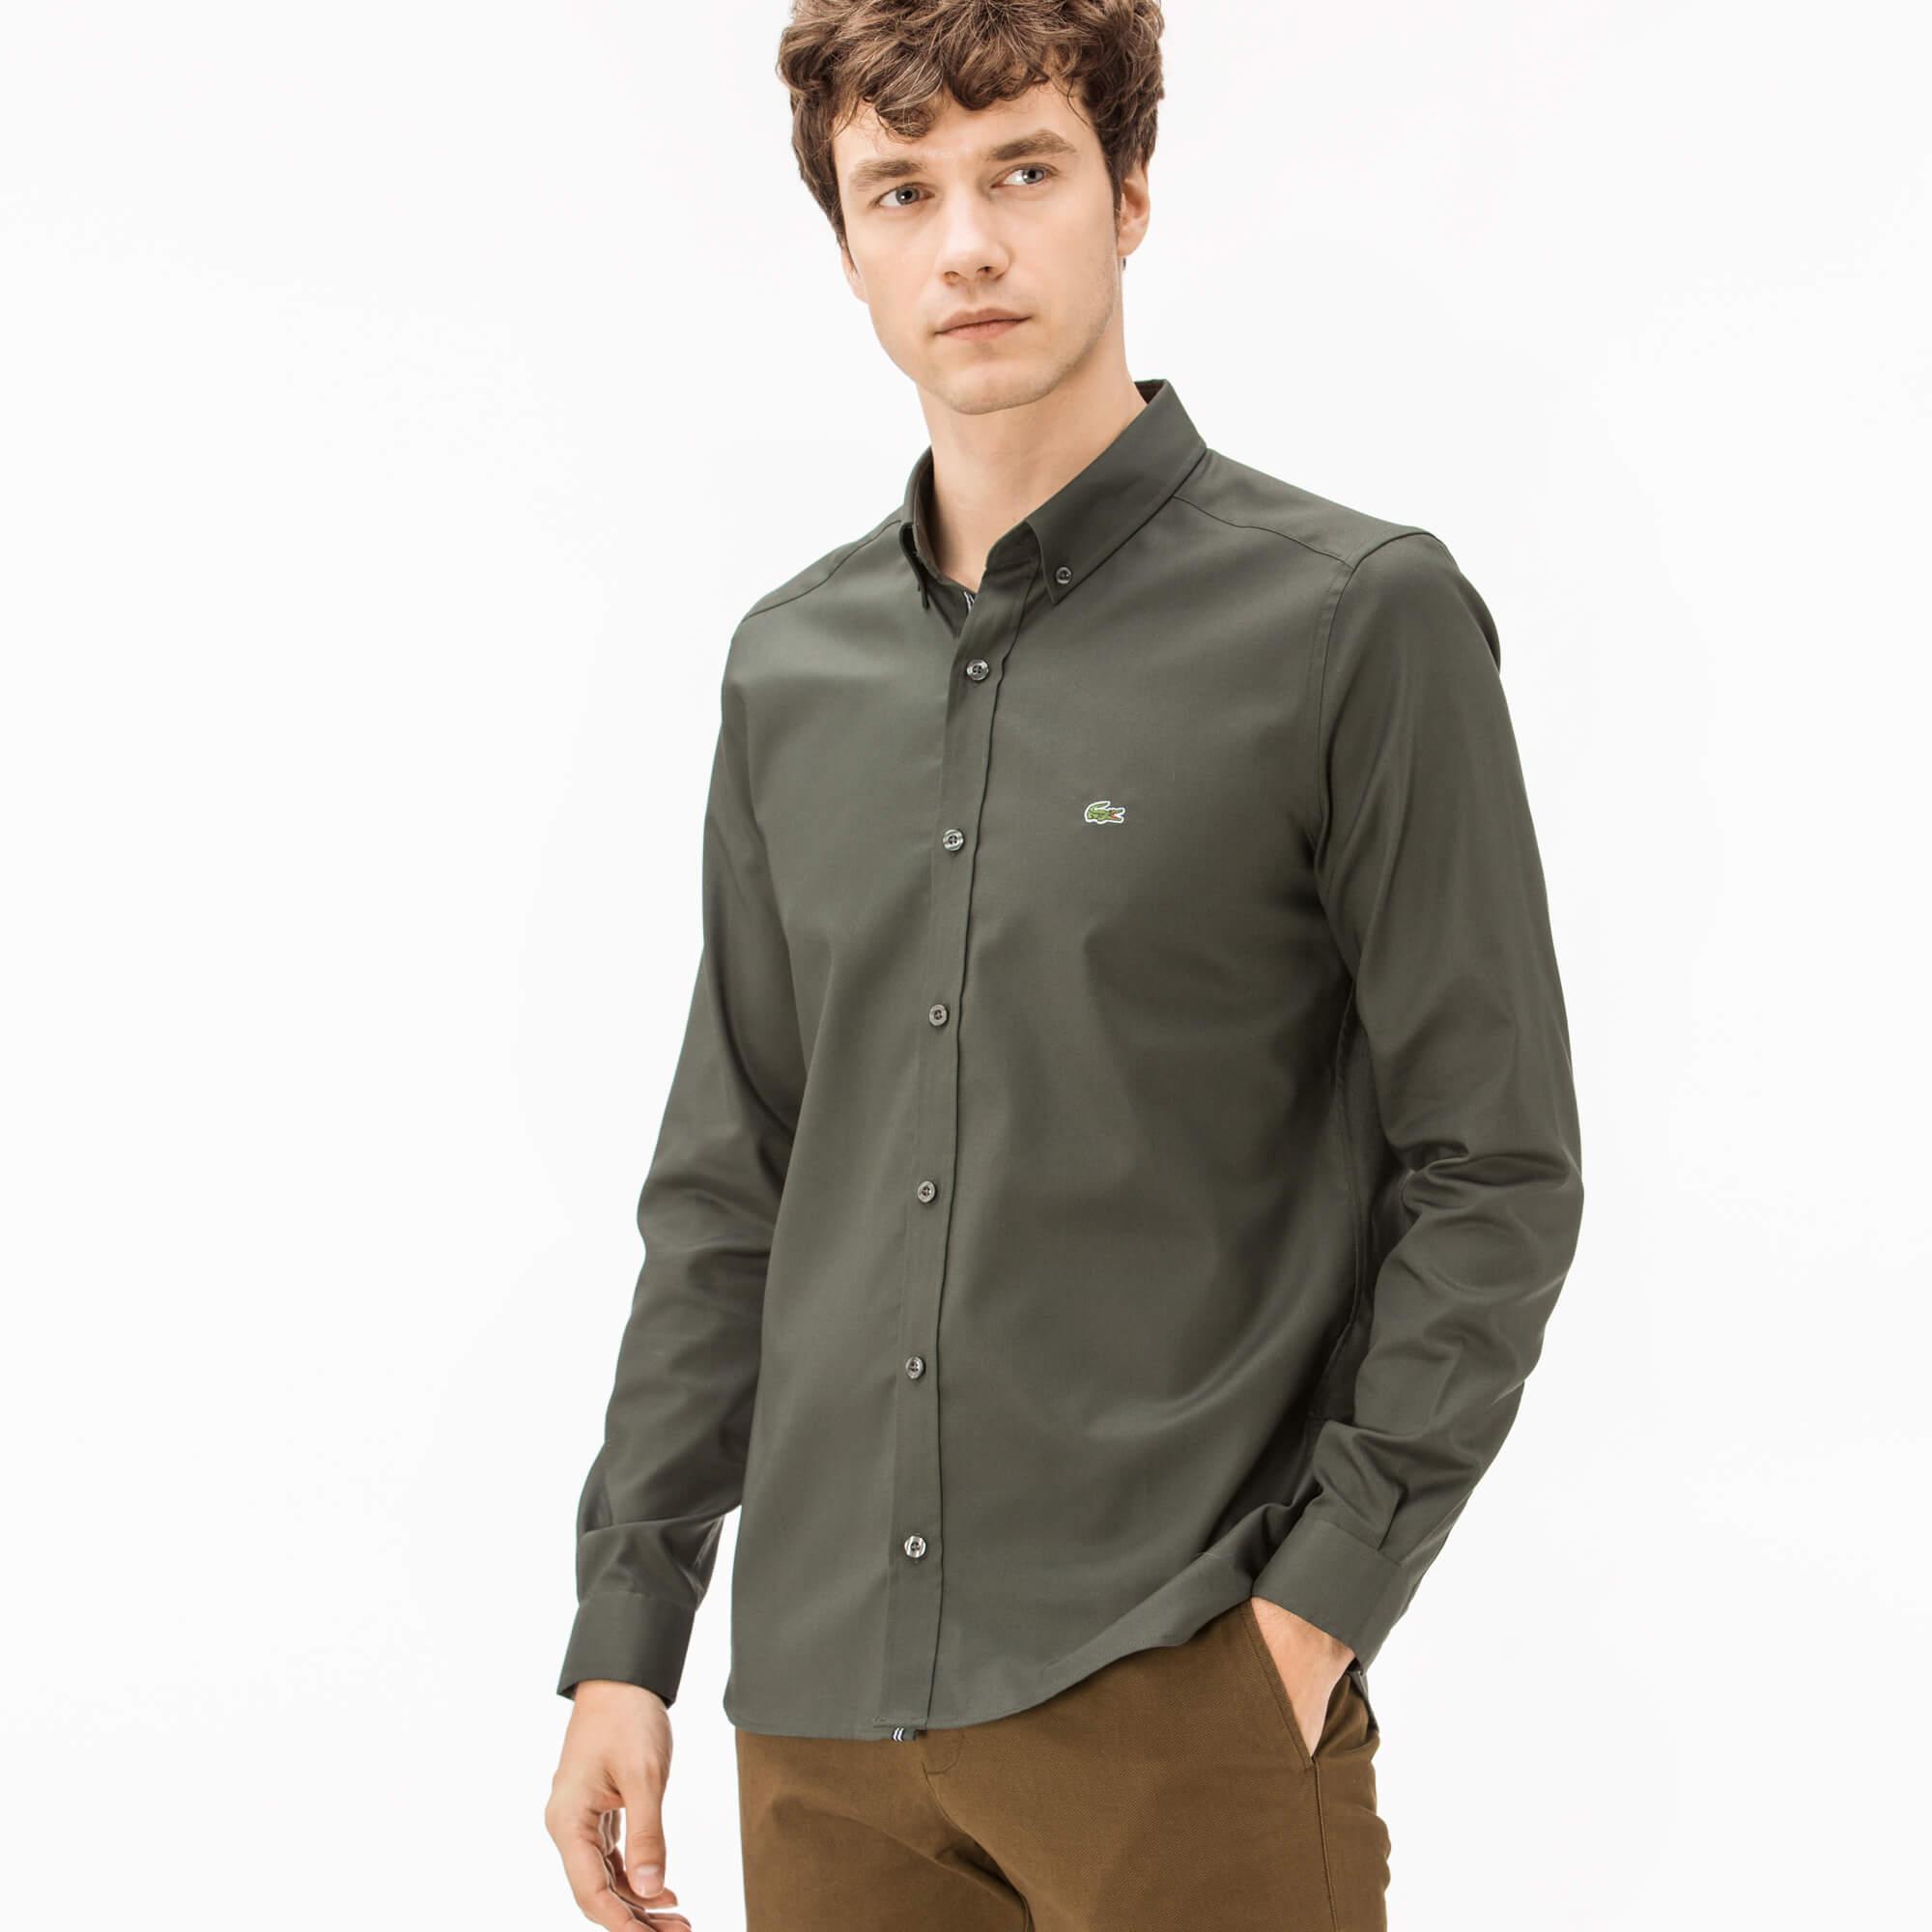 Lacoste Men's Slim Fit Oxford Shirts